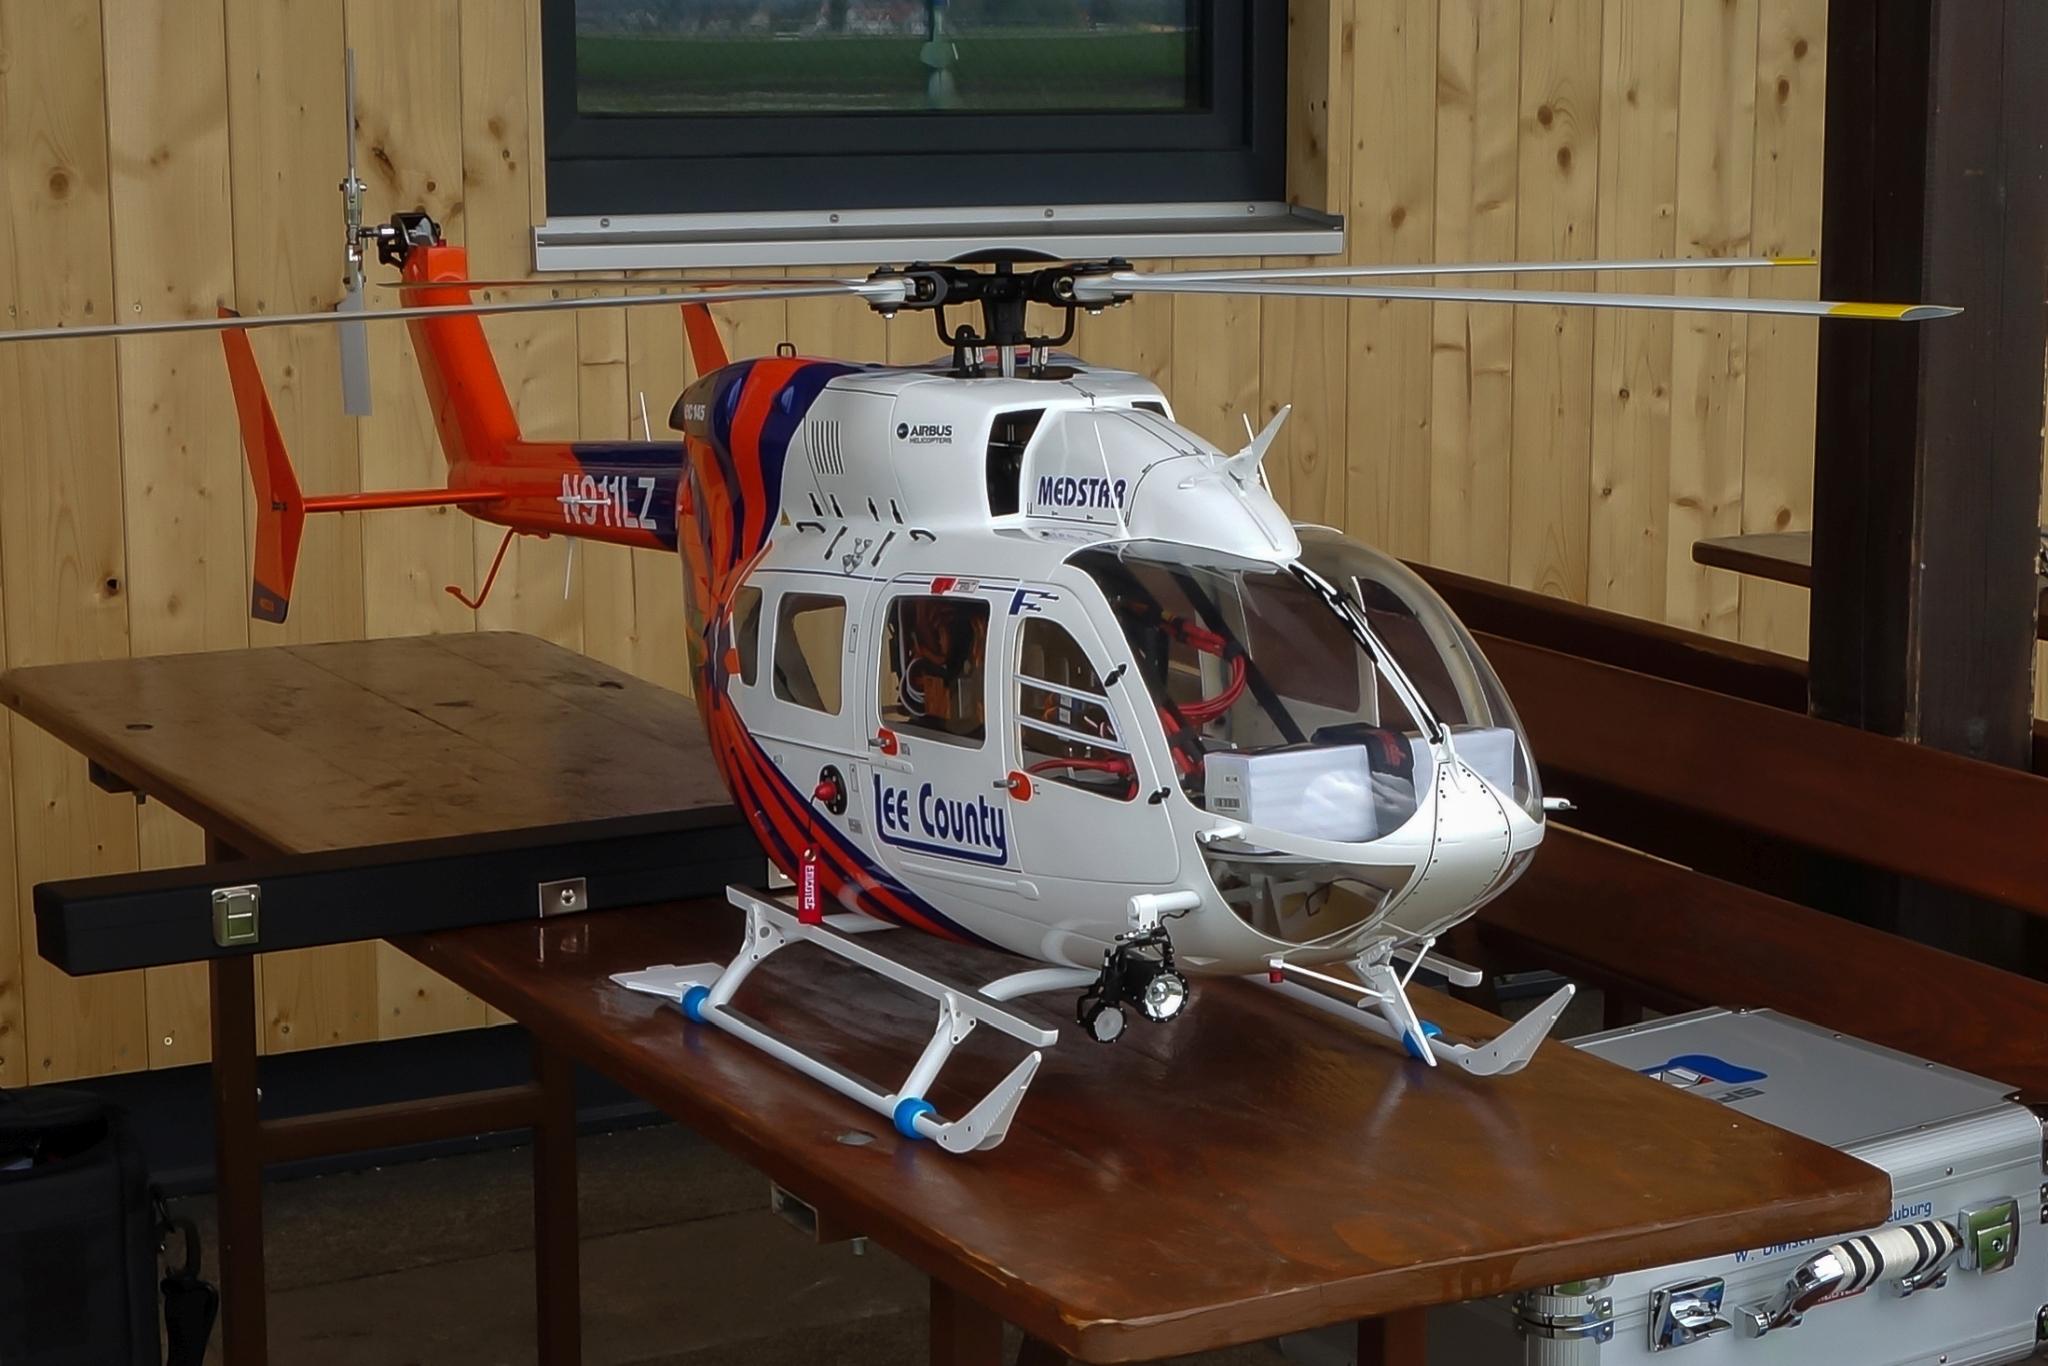 EC145 fertiggestellt und bereit zum Flug